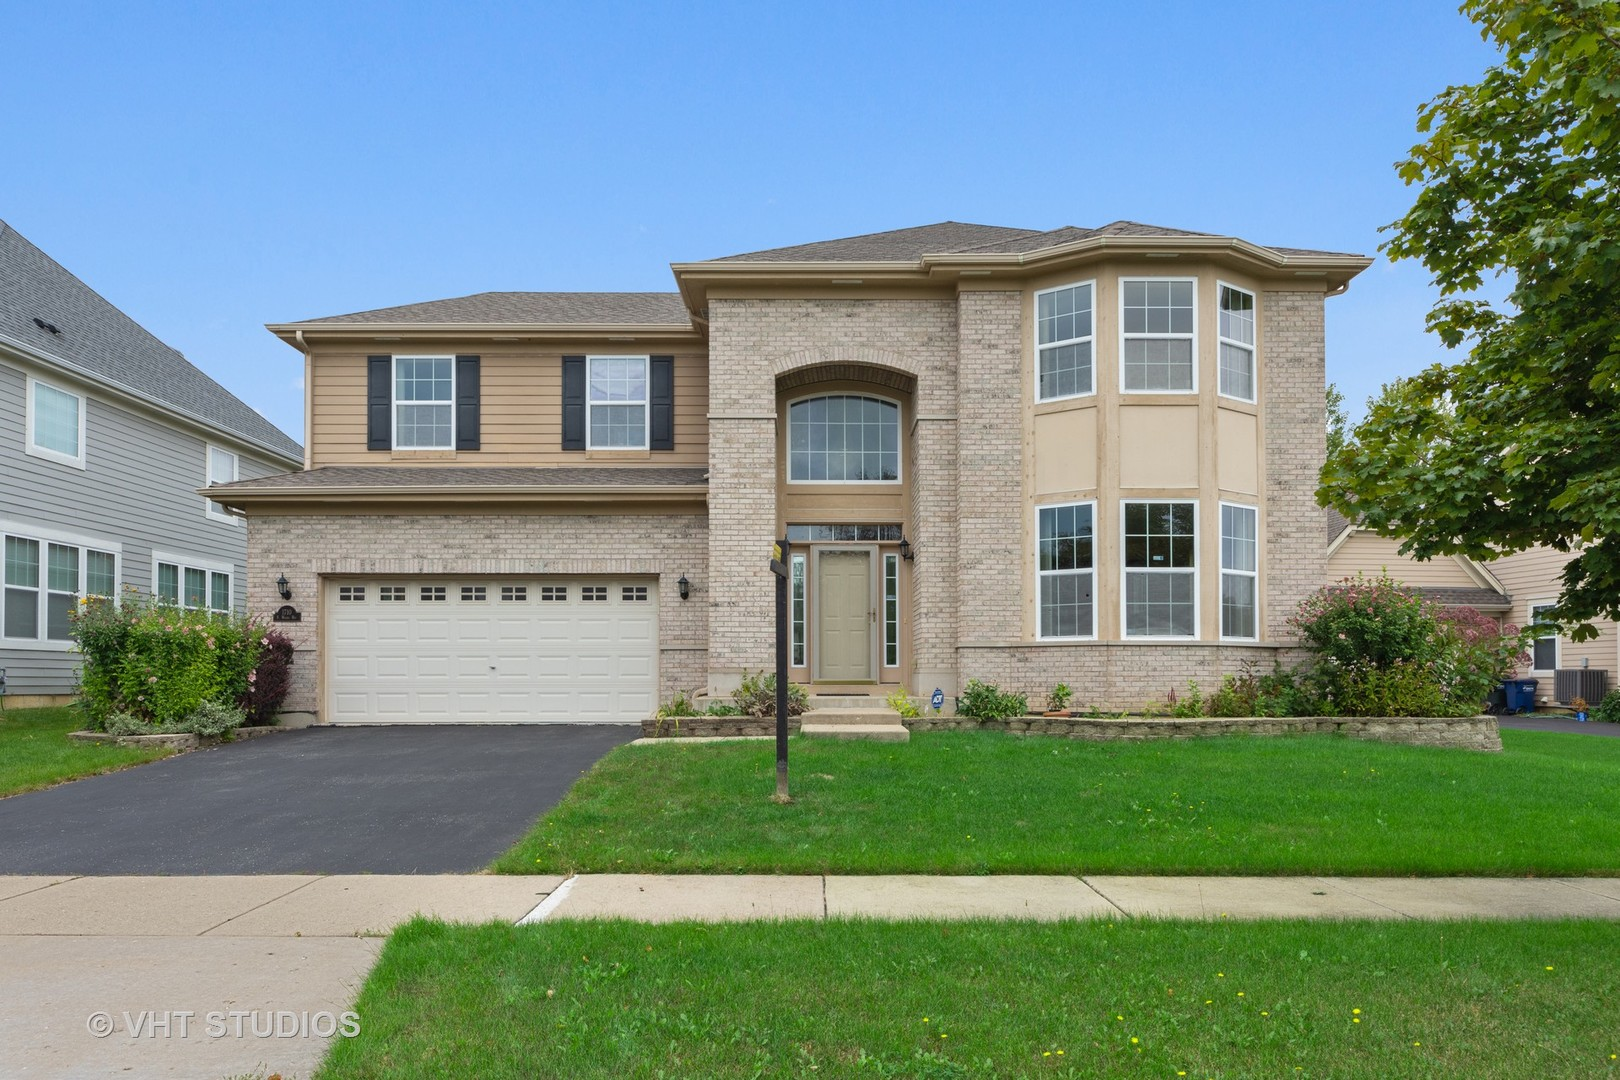 1710 North Woods Way, Vernon Hills, Illinois